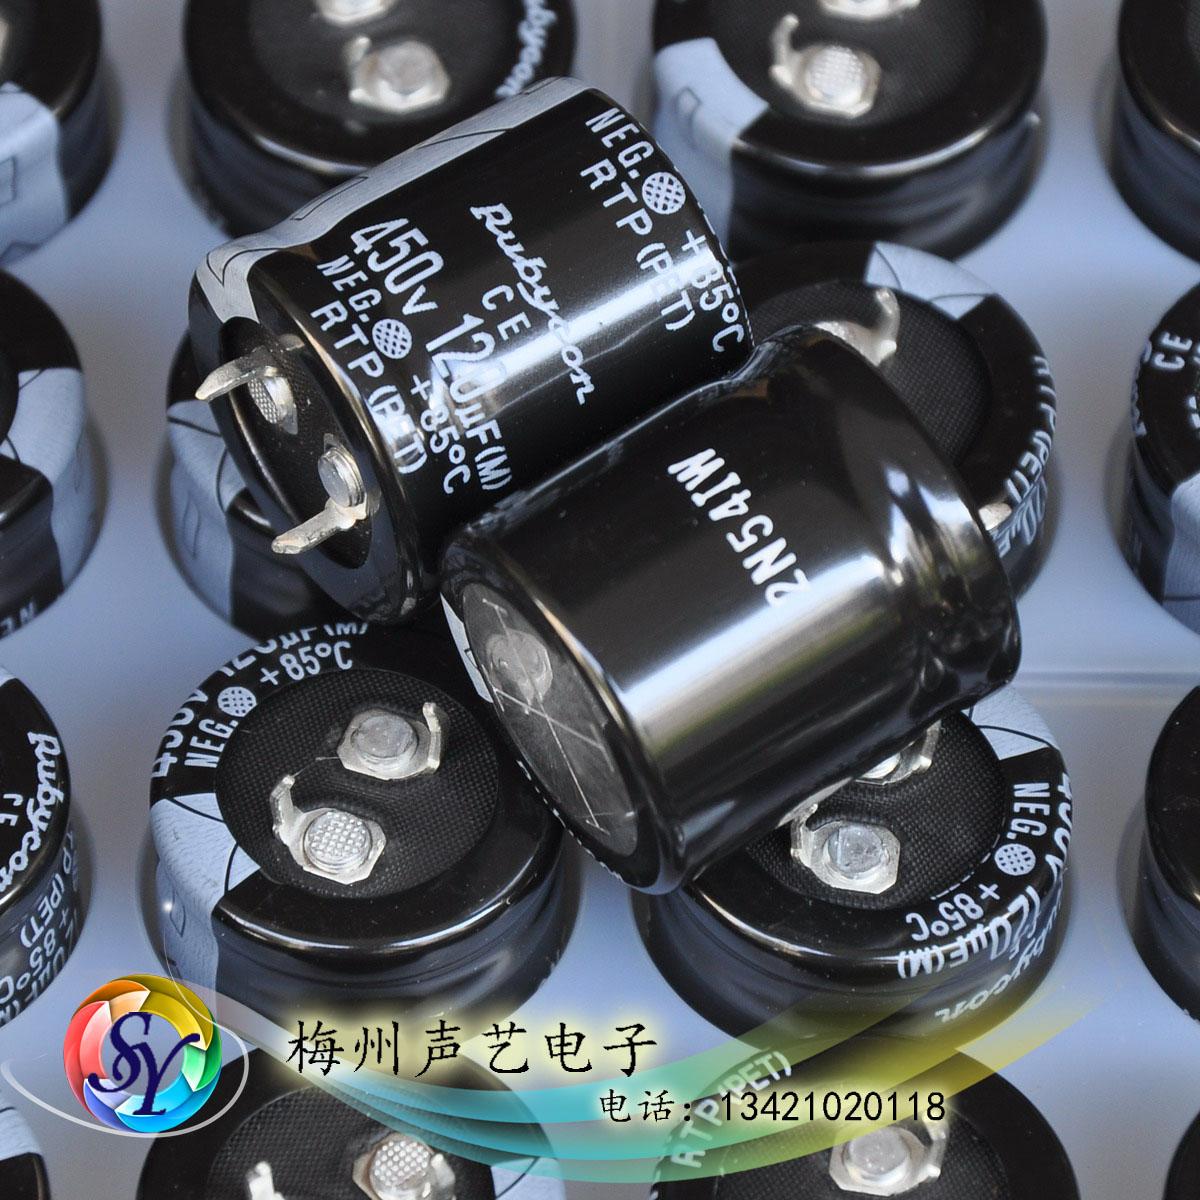 50pcs Japan Rubycon RTP 450V 120UF 25*25 high pressure filter capacitor ( Generation 100UF) free shipping(China (Mainland))